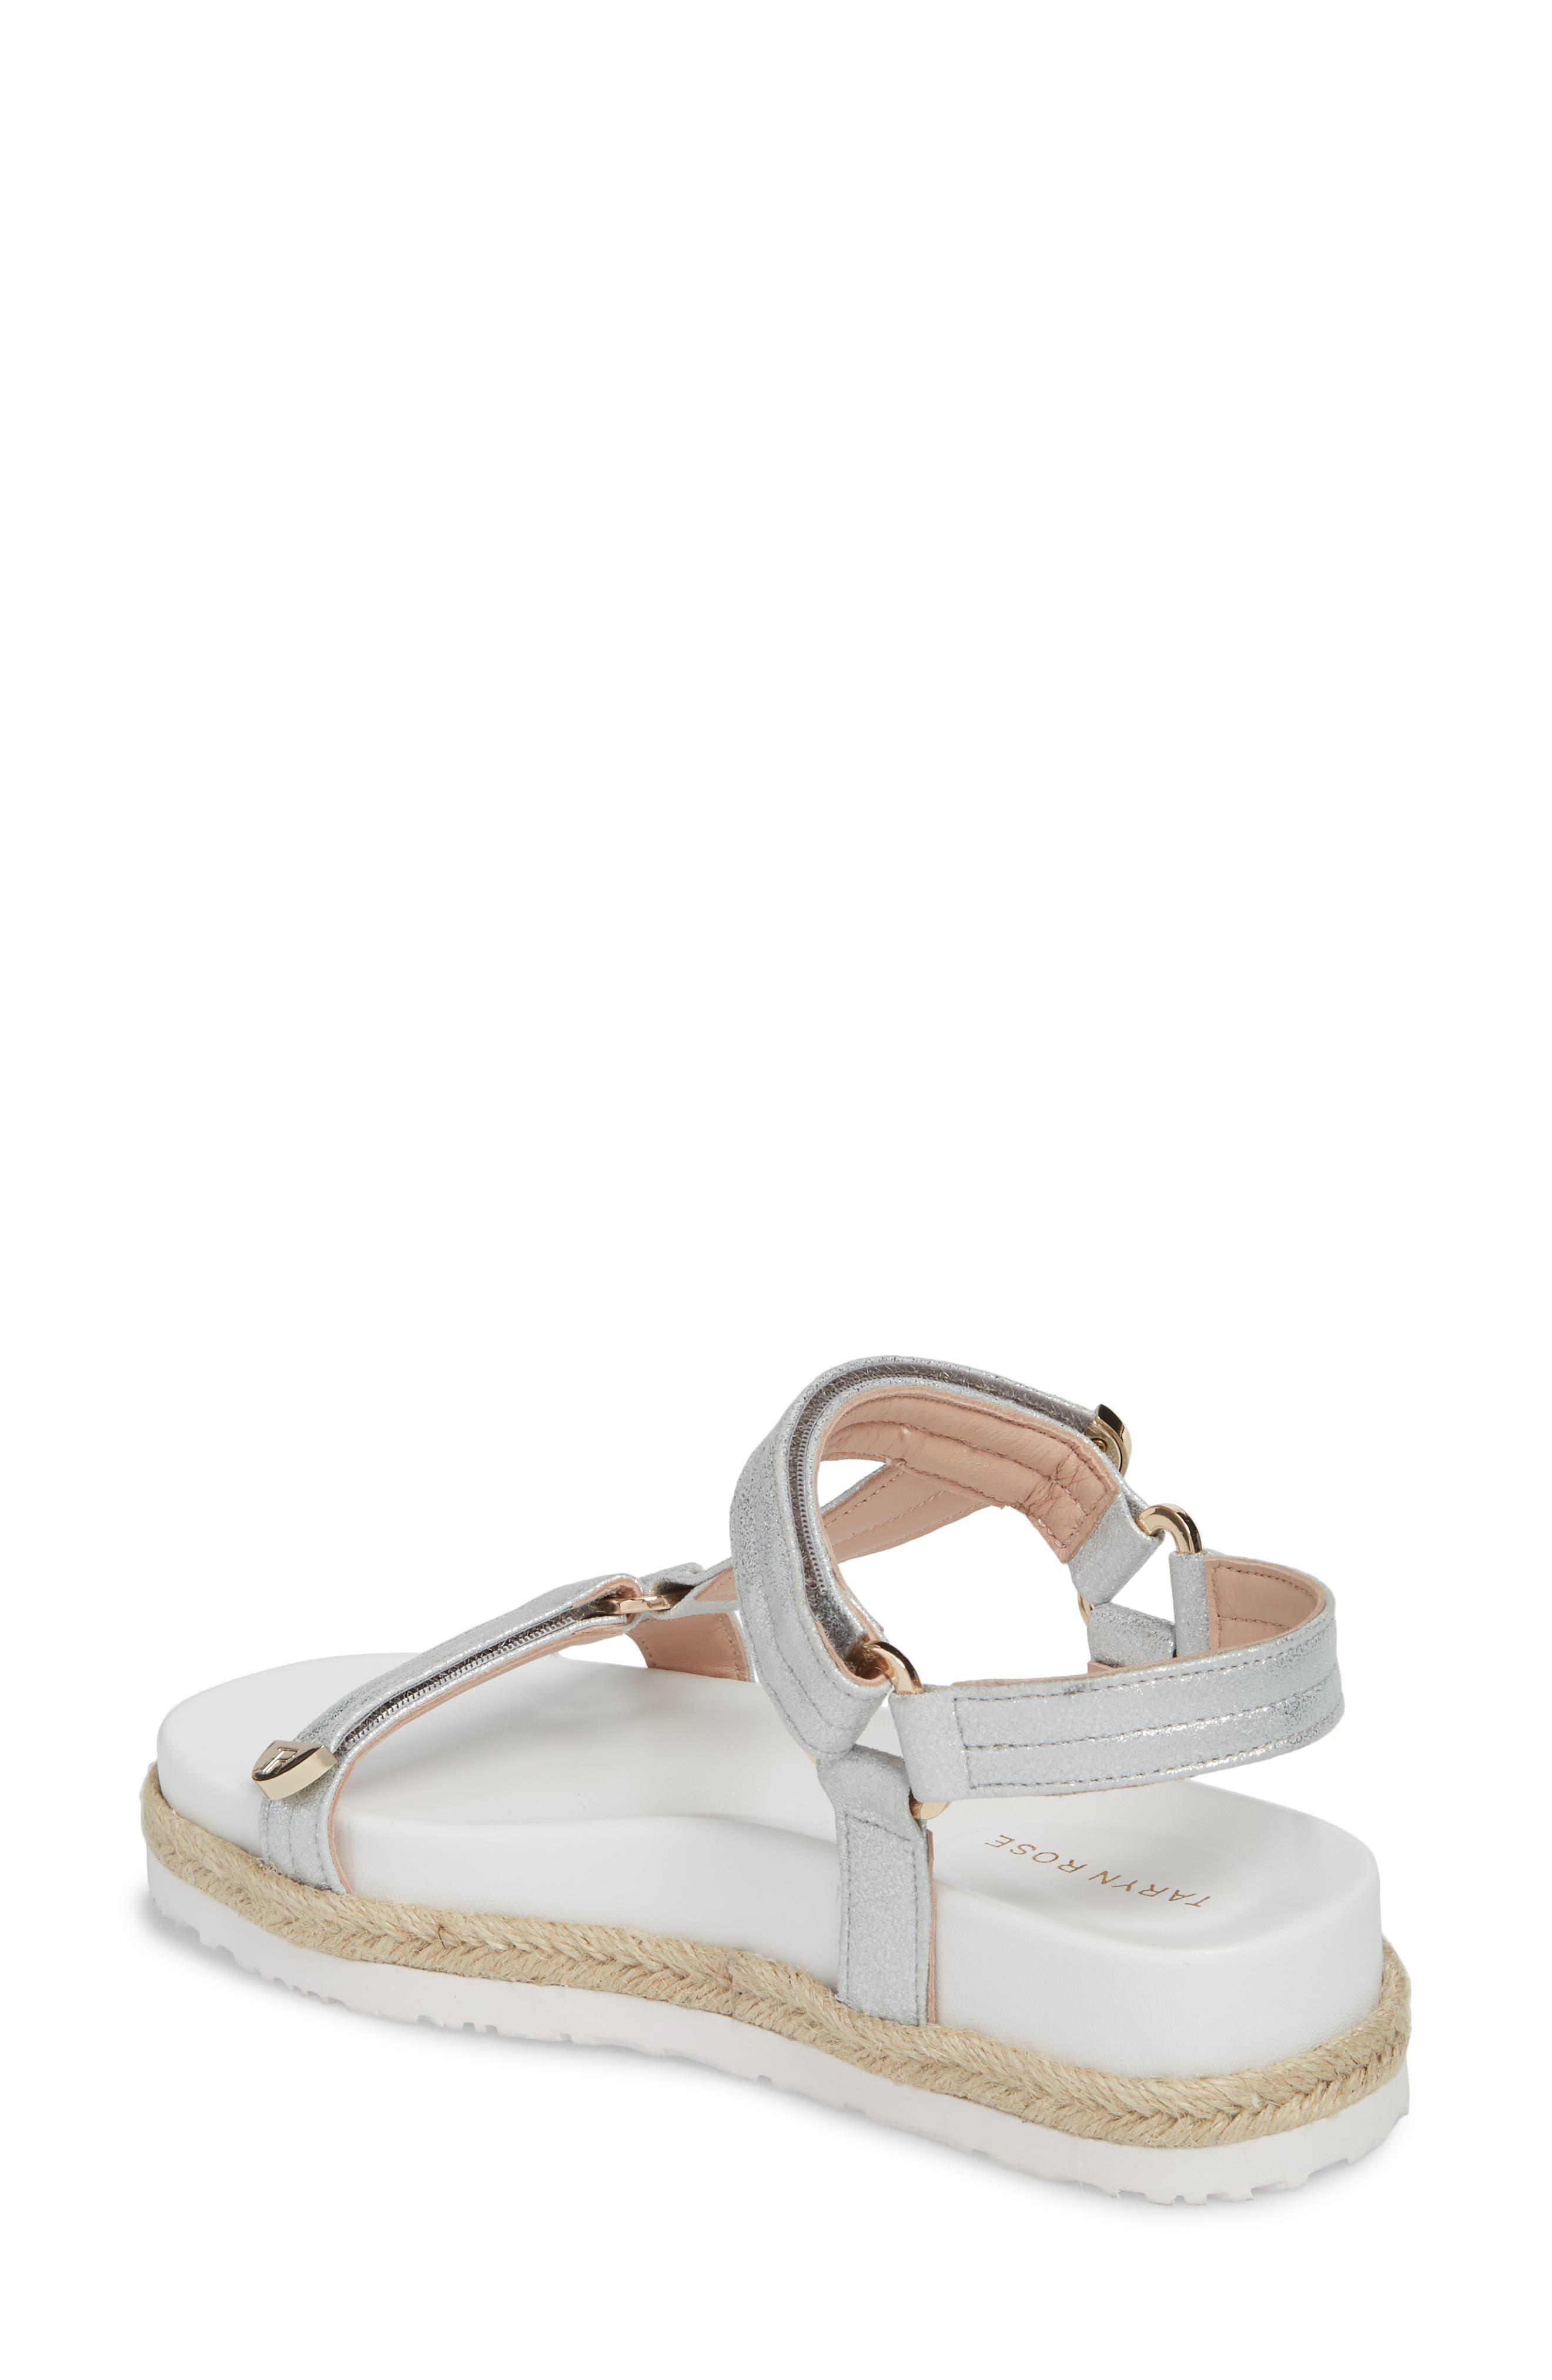 Lydia Platform Sport Sandal,                             Alternate thumbnail 2, color,                             040